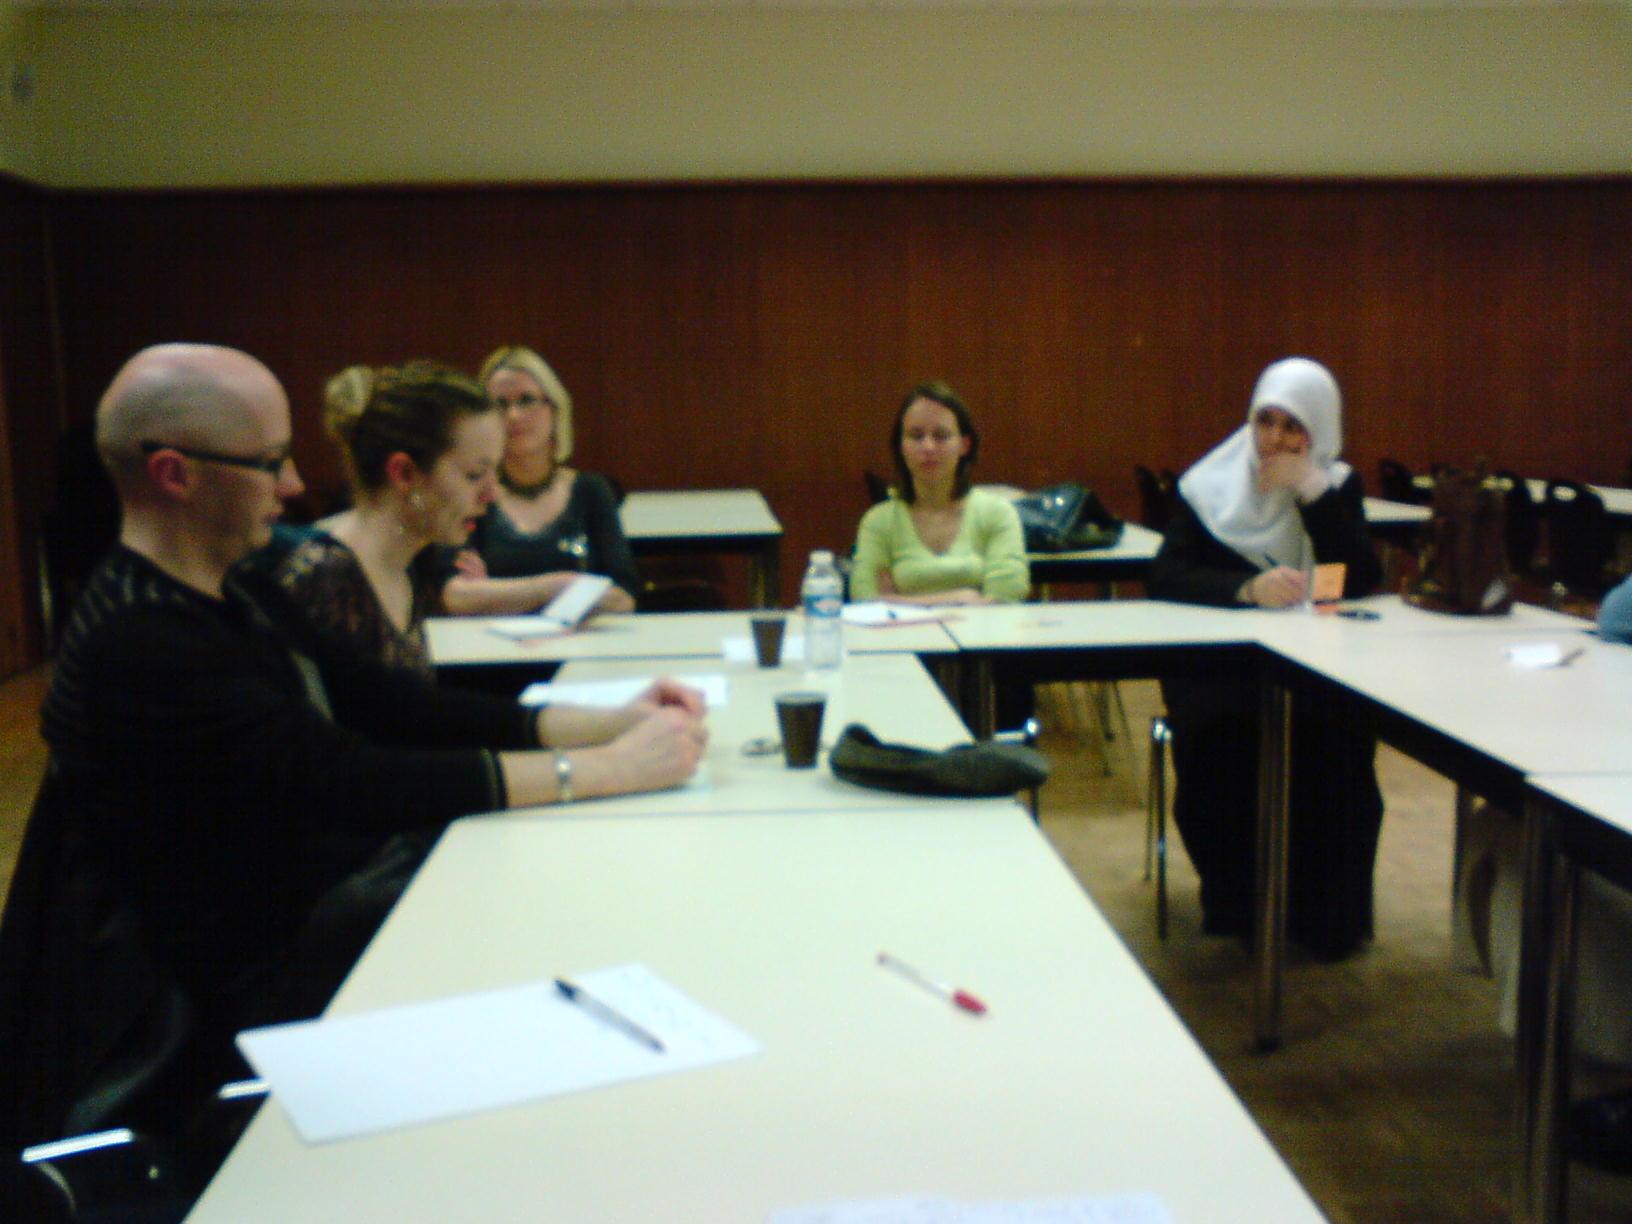 rencontres des doctorants    doctoral meetings  2010